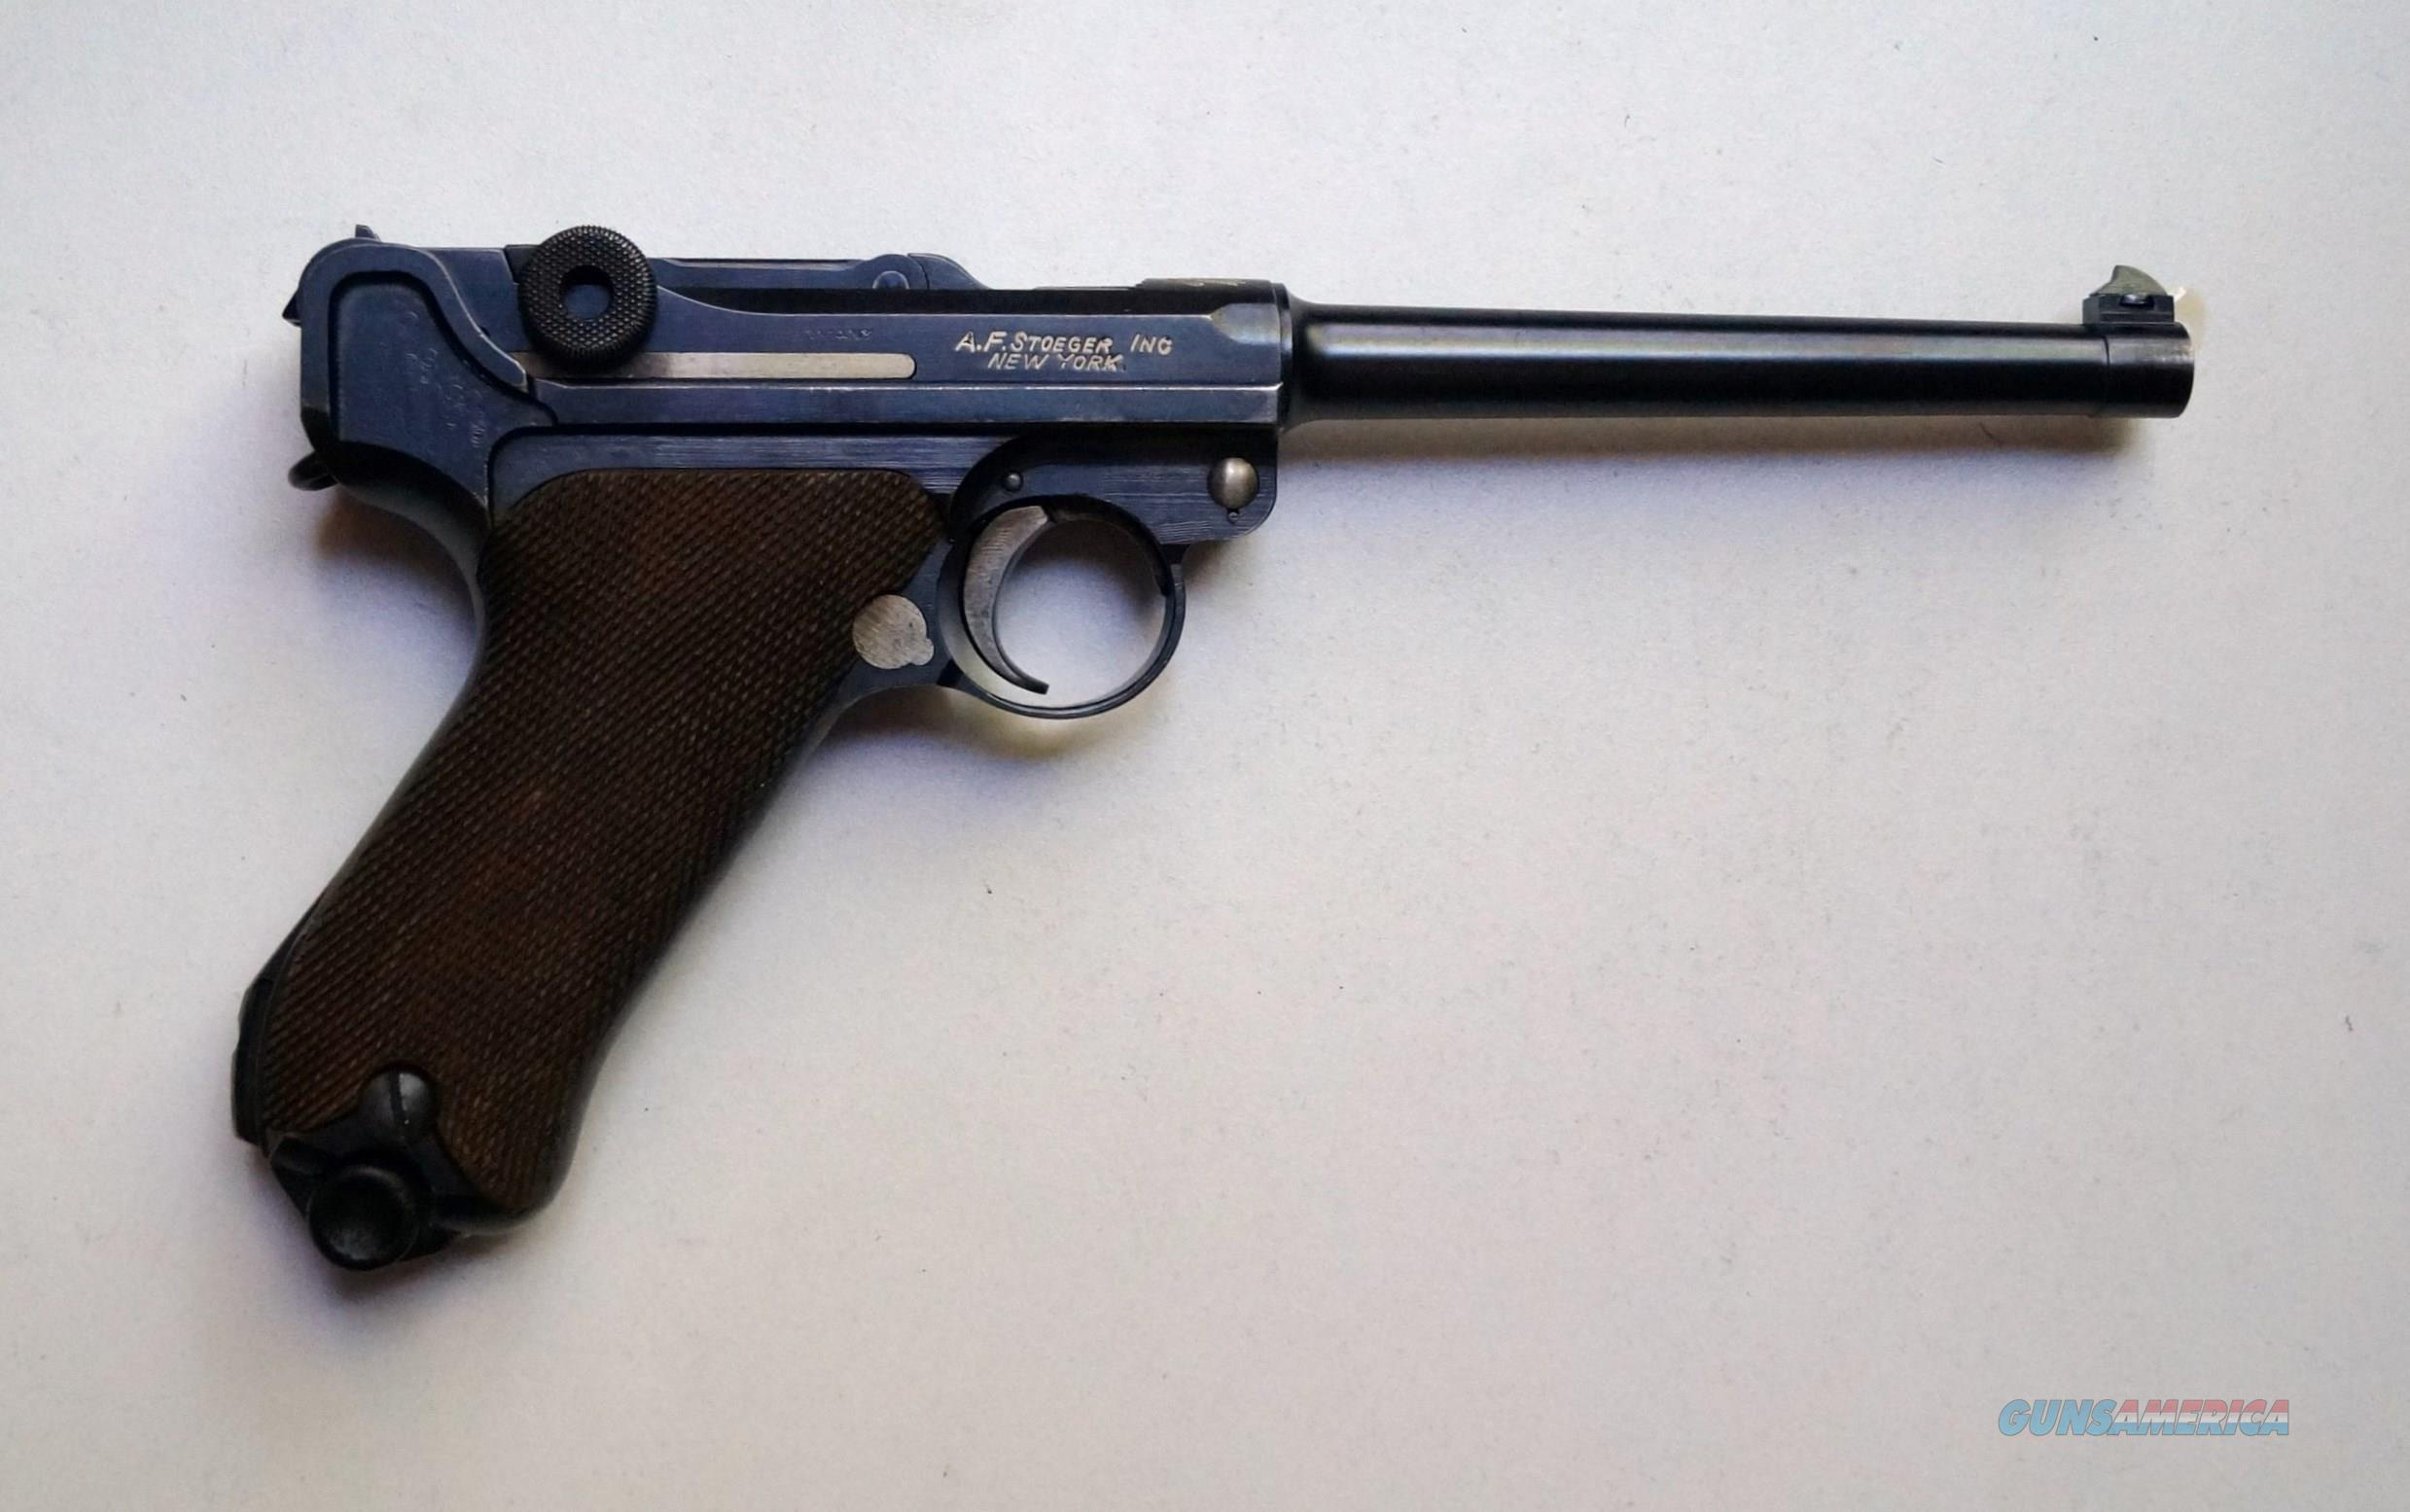 "DWM A.F. STOEGER AMERICAN EAGLE GERMAN LUGER WITH A 6"" BARREL  Guns > Pistols > Luger Pistols"